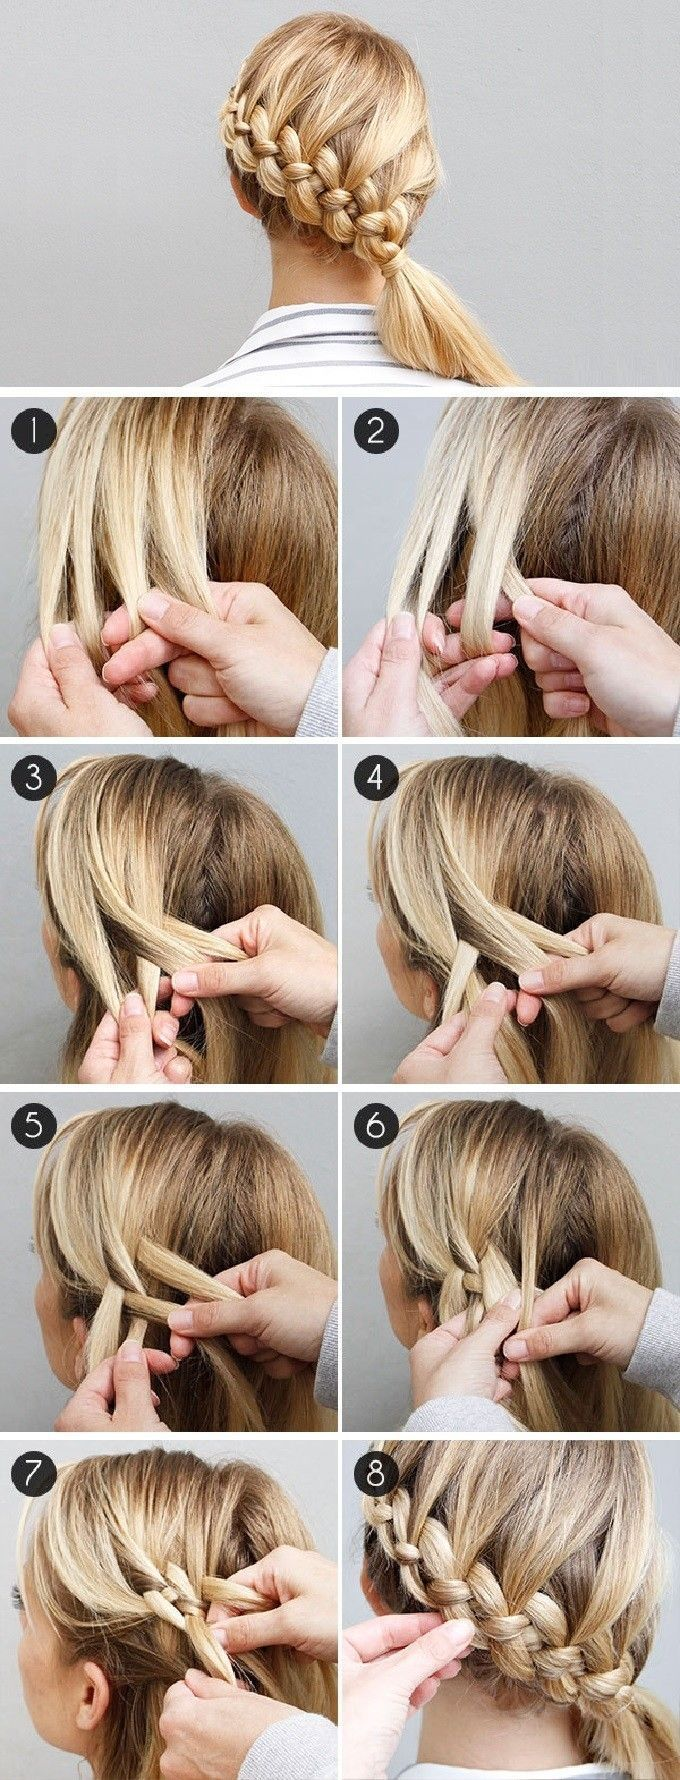 A step-by-step guide to 4 strand Dutch braids by Divine Caroline -- 'The Four-Strand Braid Made Easy-ish'